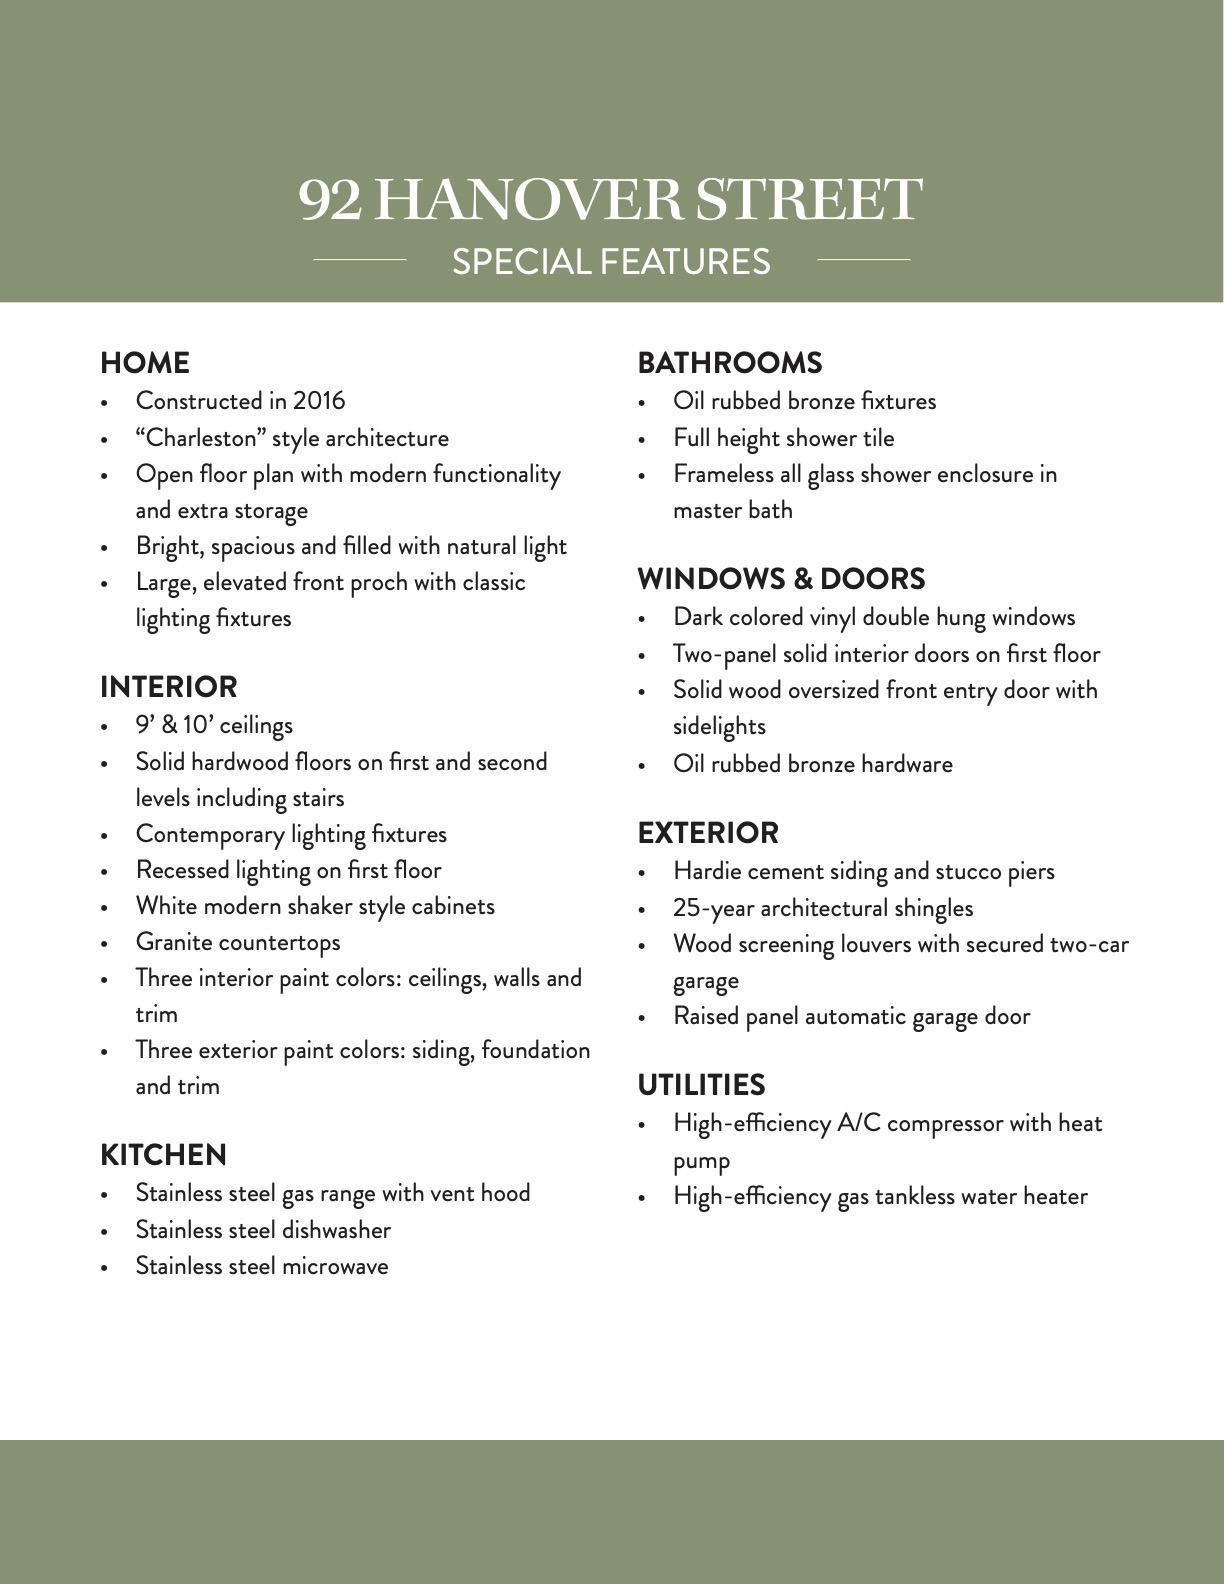 92 Hanover Street Charleston, SC 29403